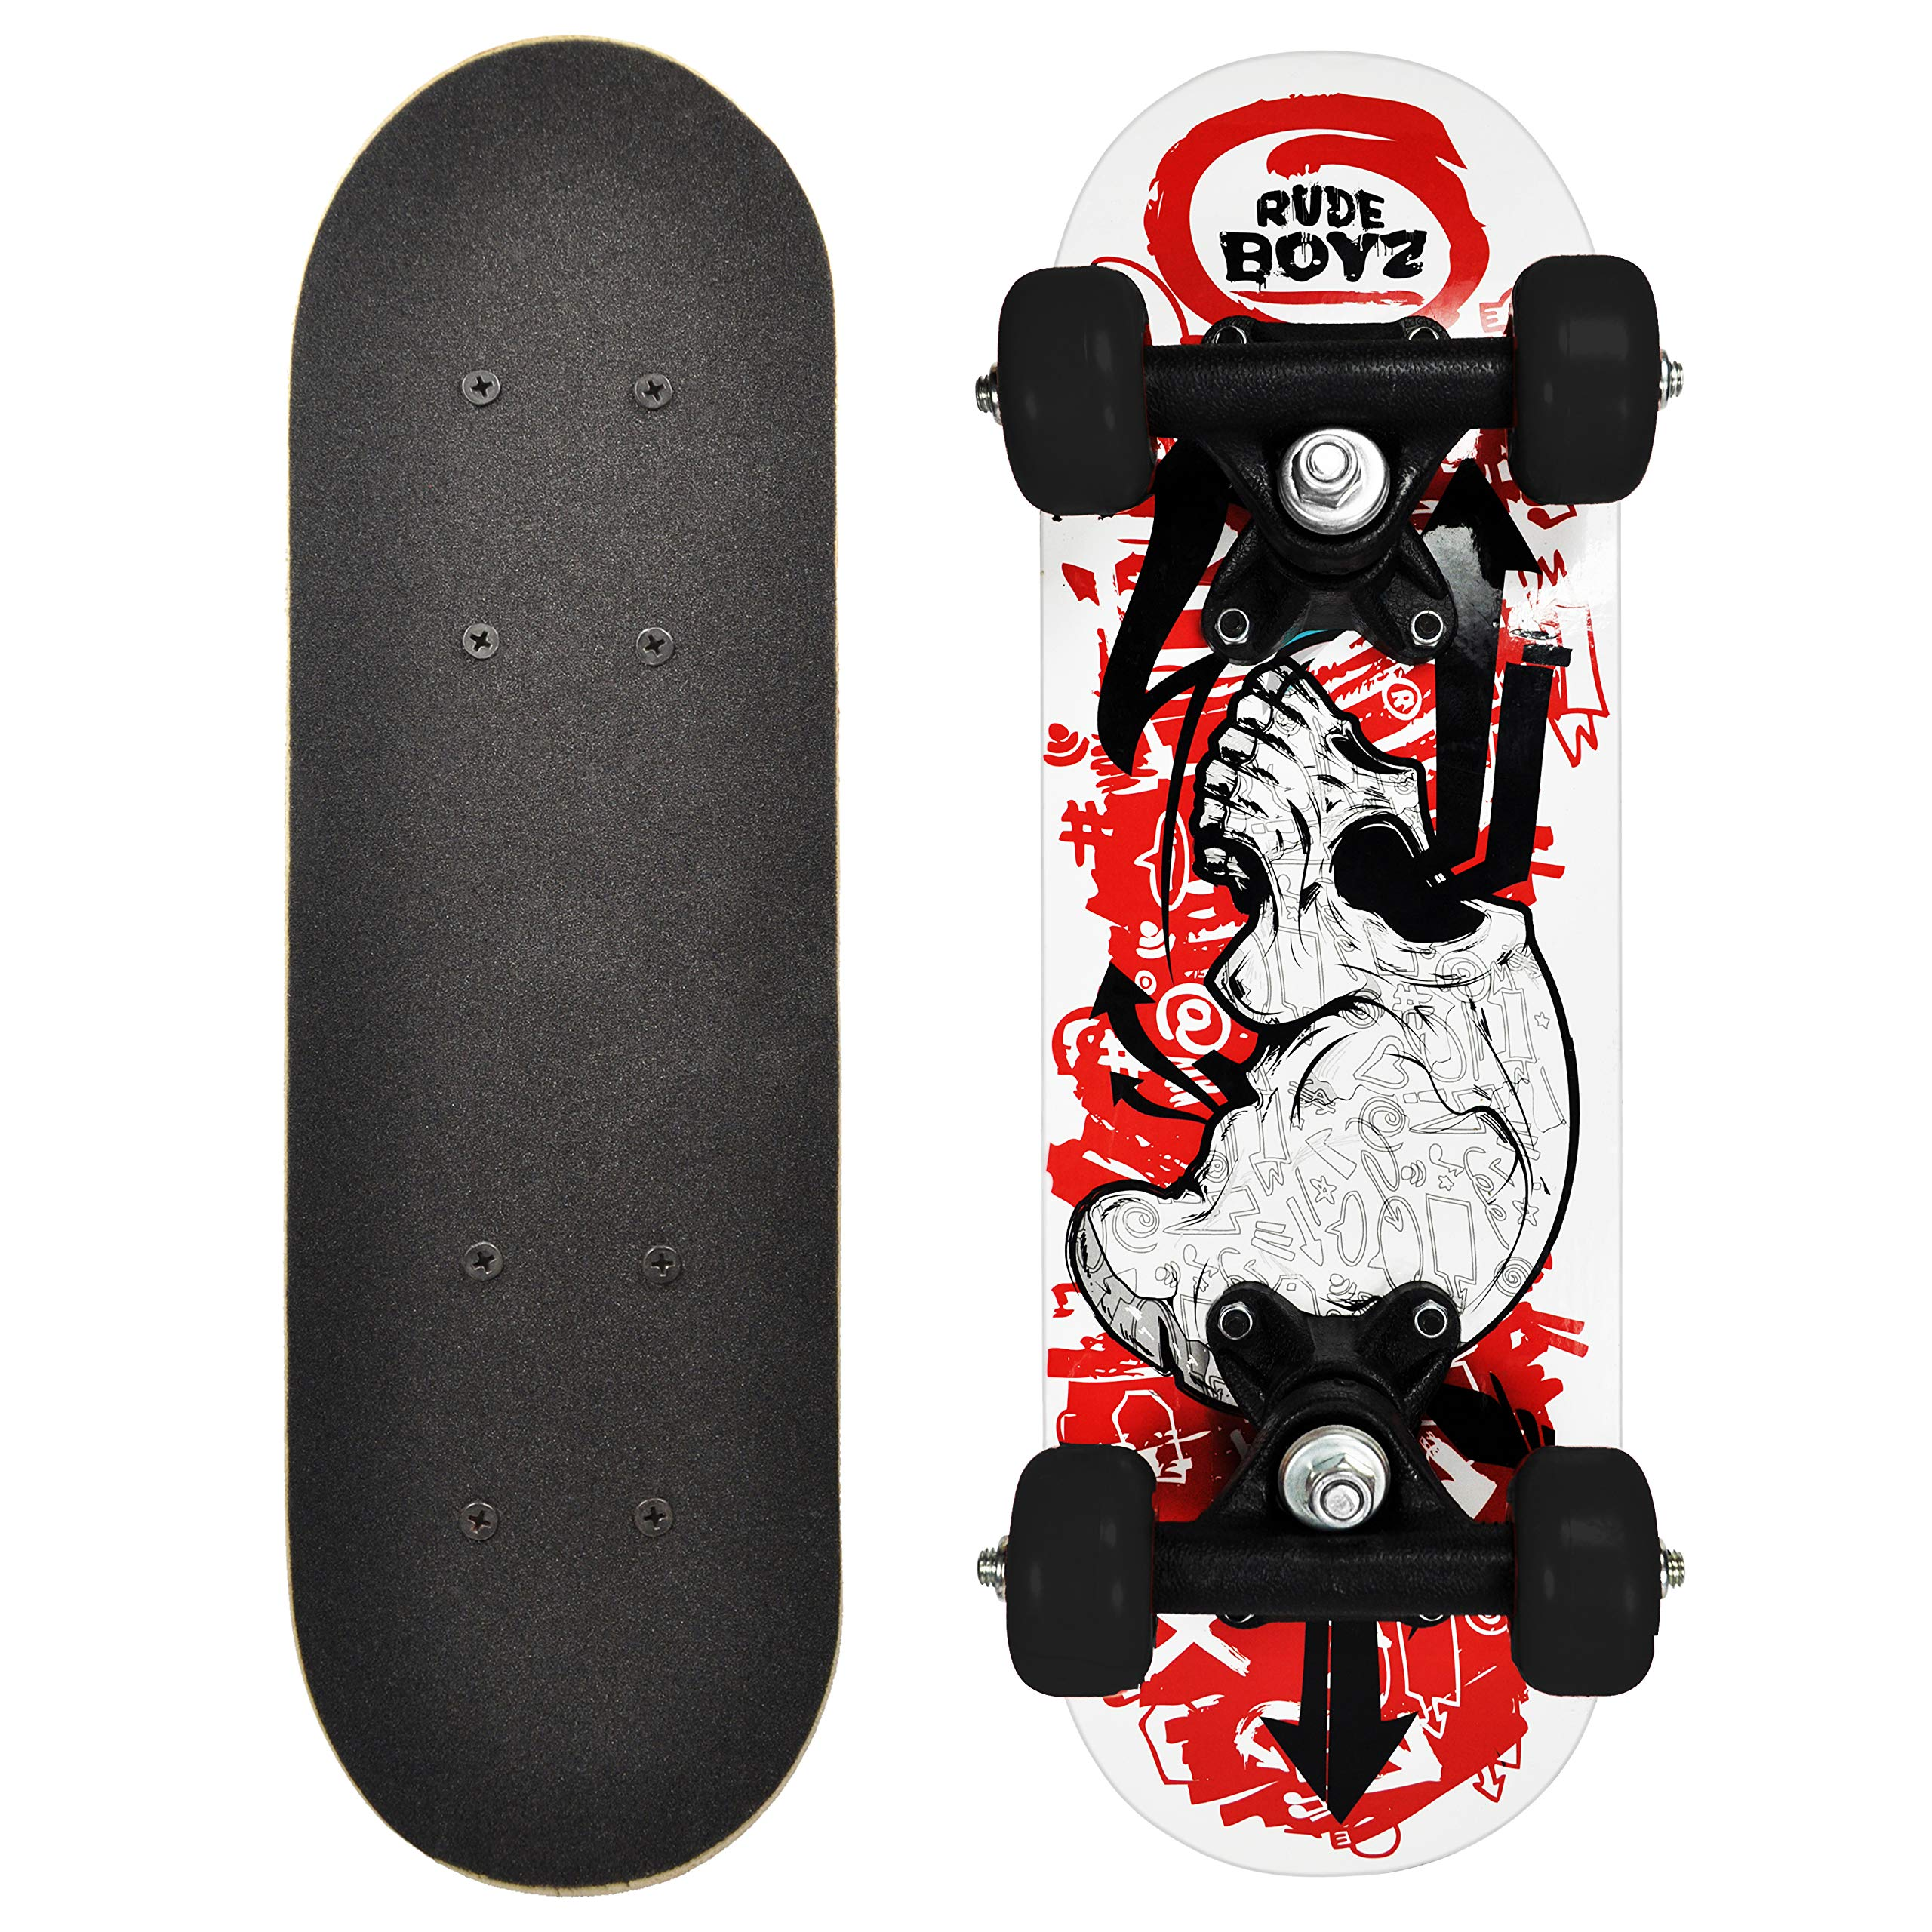 RudeBoyz 17 Inch Mini Wooden Cruiser Graphic Beginner Skateboard (Skull Design) by RudeBoyz